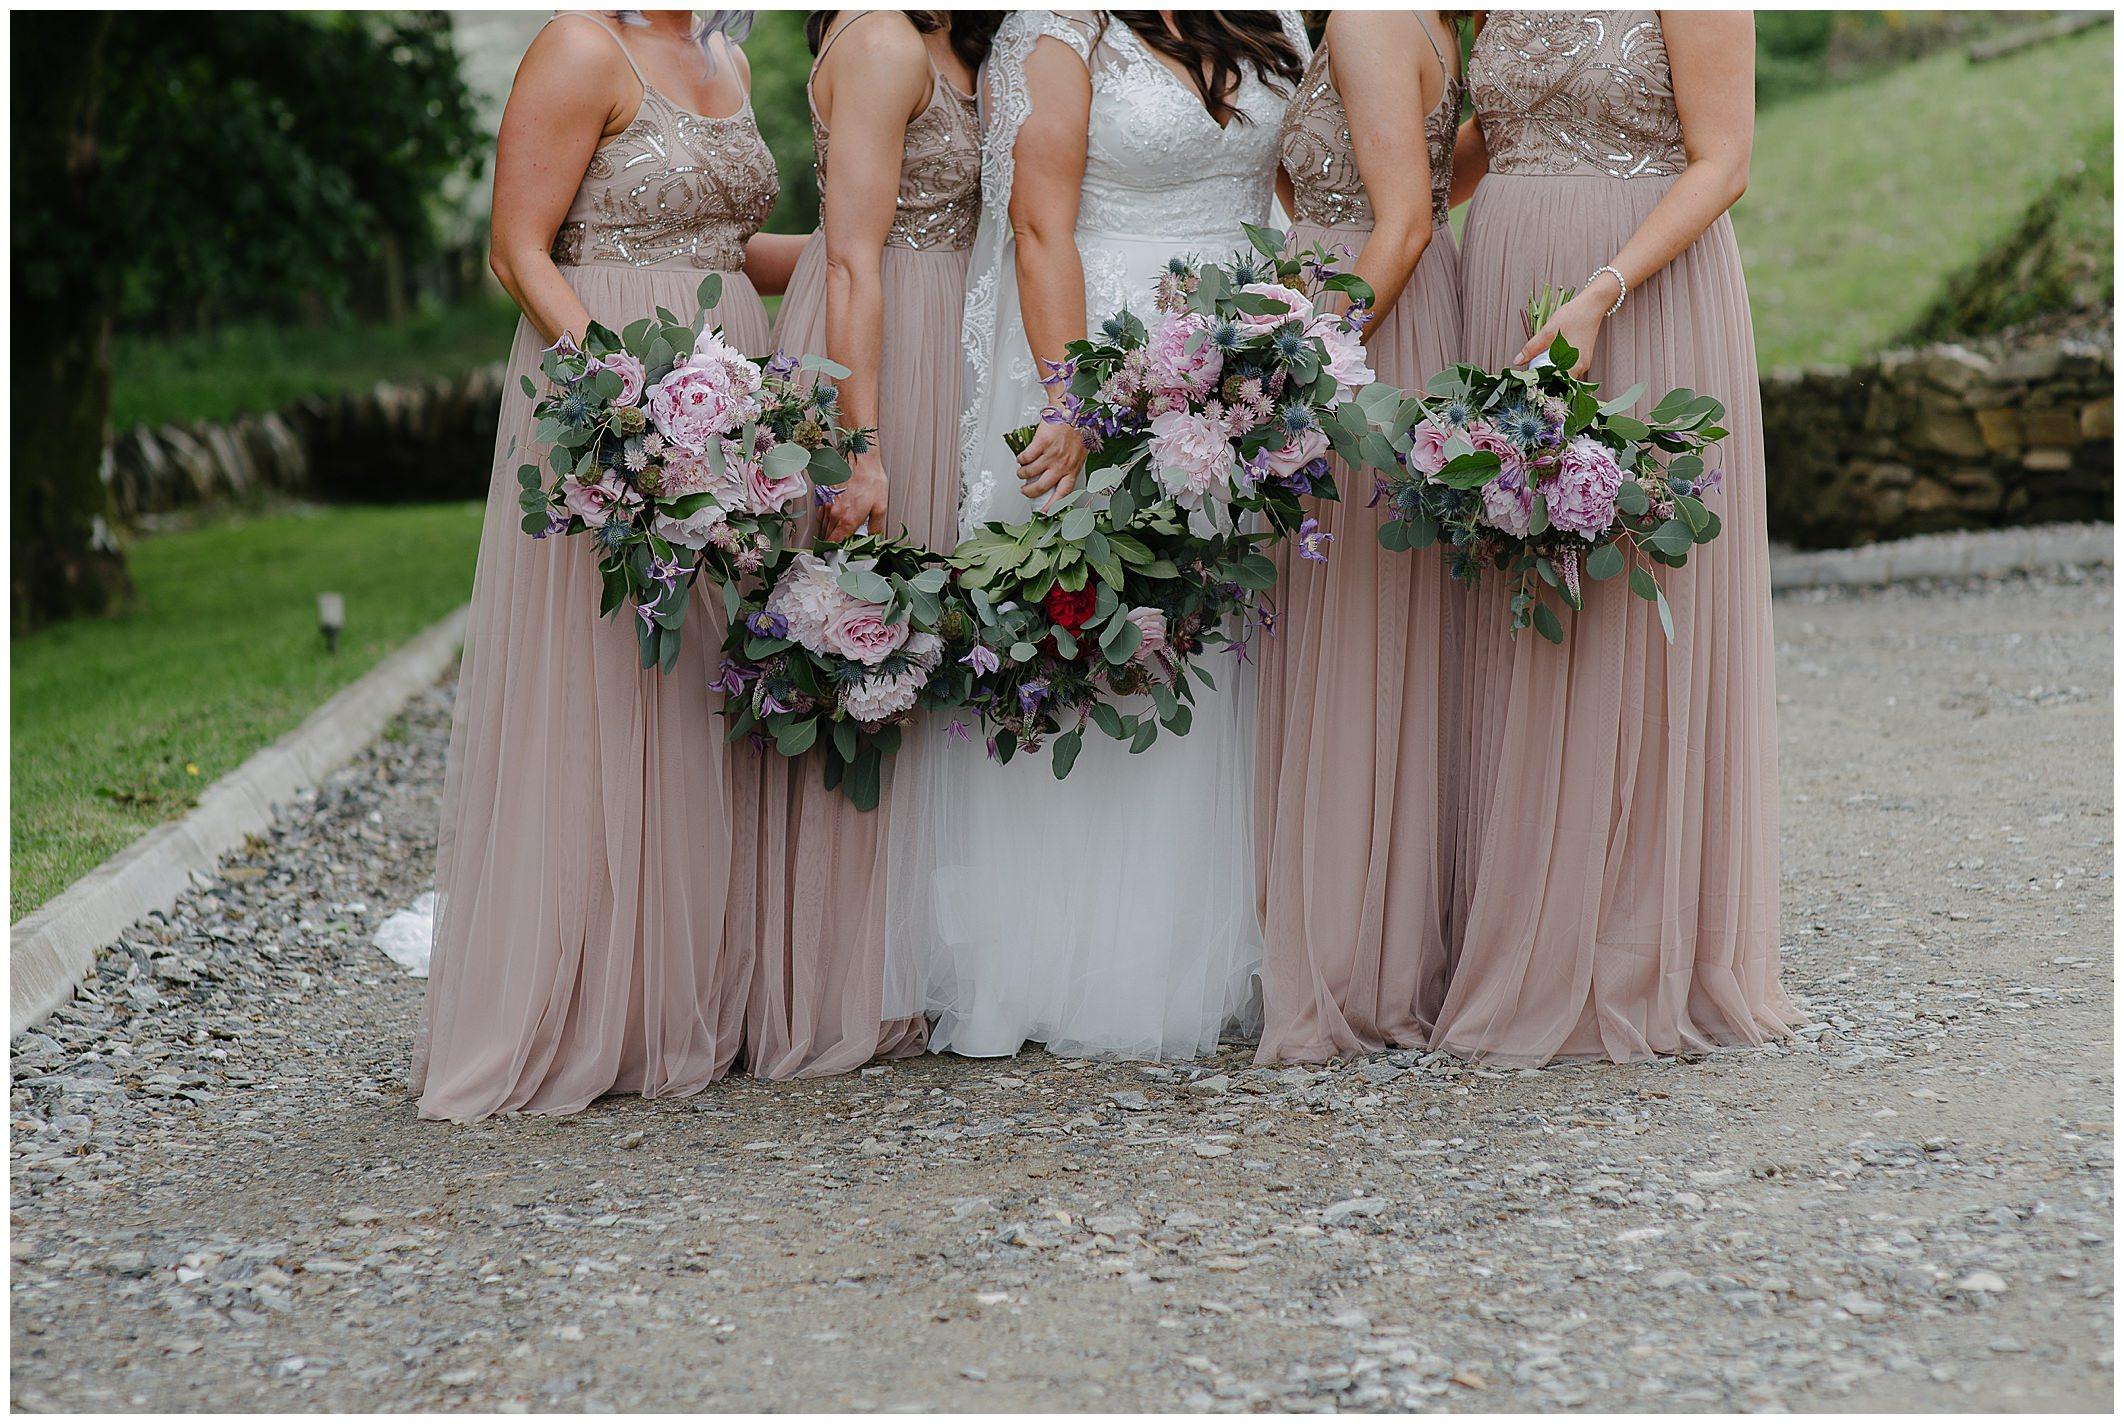 redcastle-hotel-wedding-karen-brian-jude-browne-photography-027.jpg